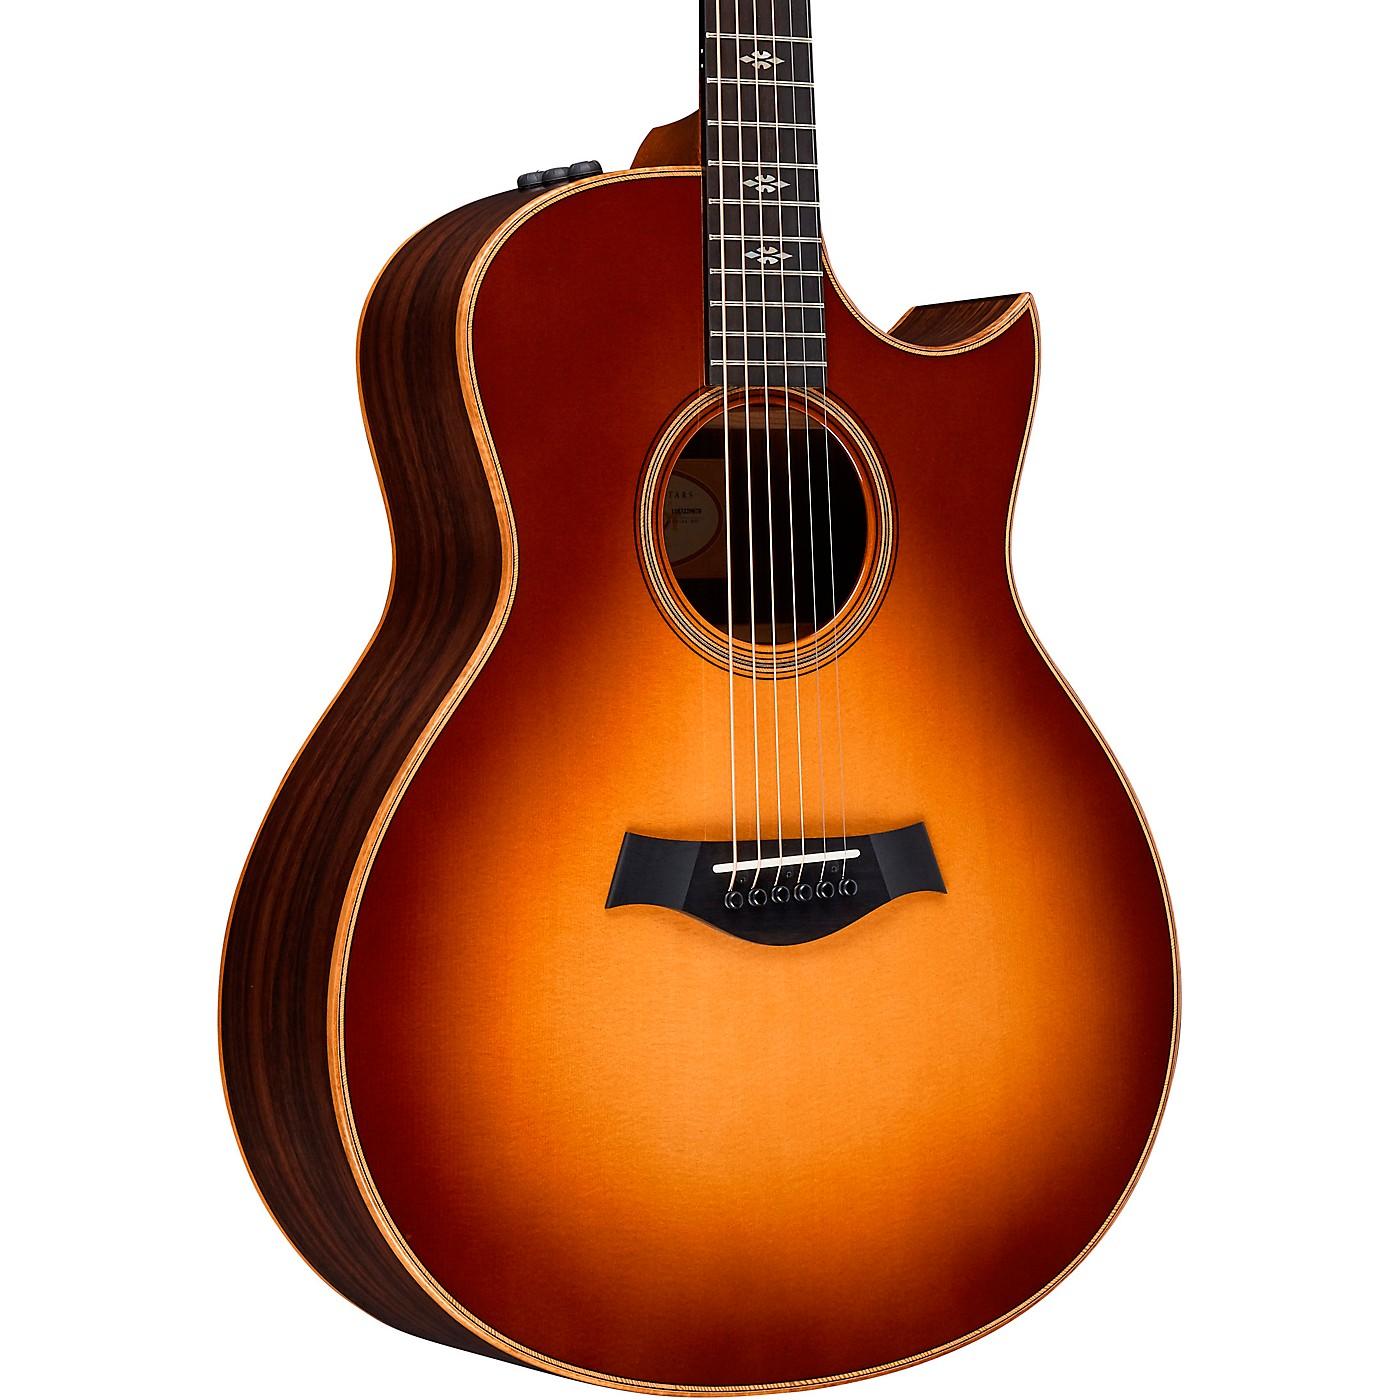 Taylor 700 Series 716ce-WSB-Flor-NoPG Grand Symphony Acoustic-Electric Guitar thumbnail